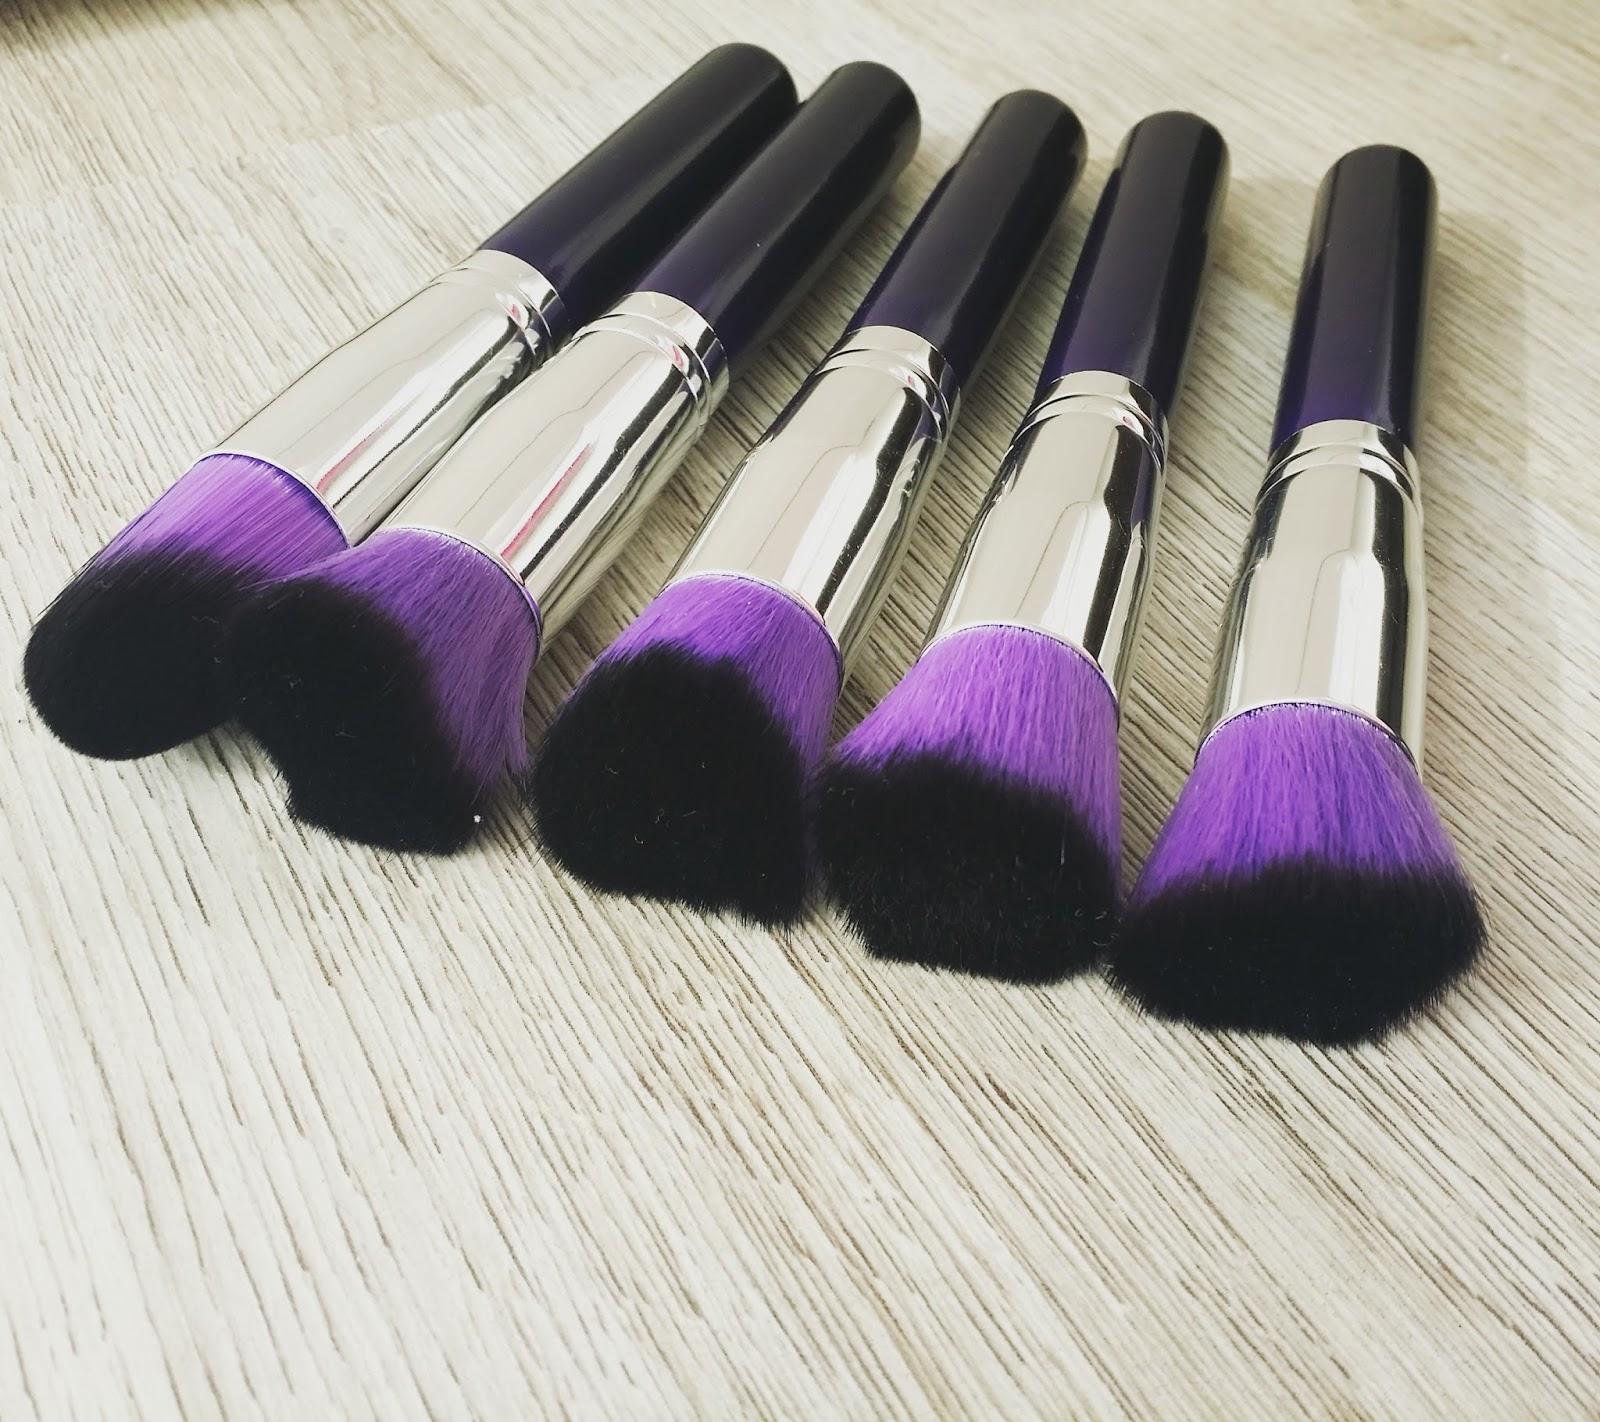 banggood-pennelli-makeup-opinione